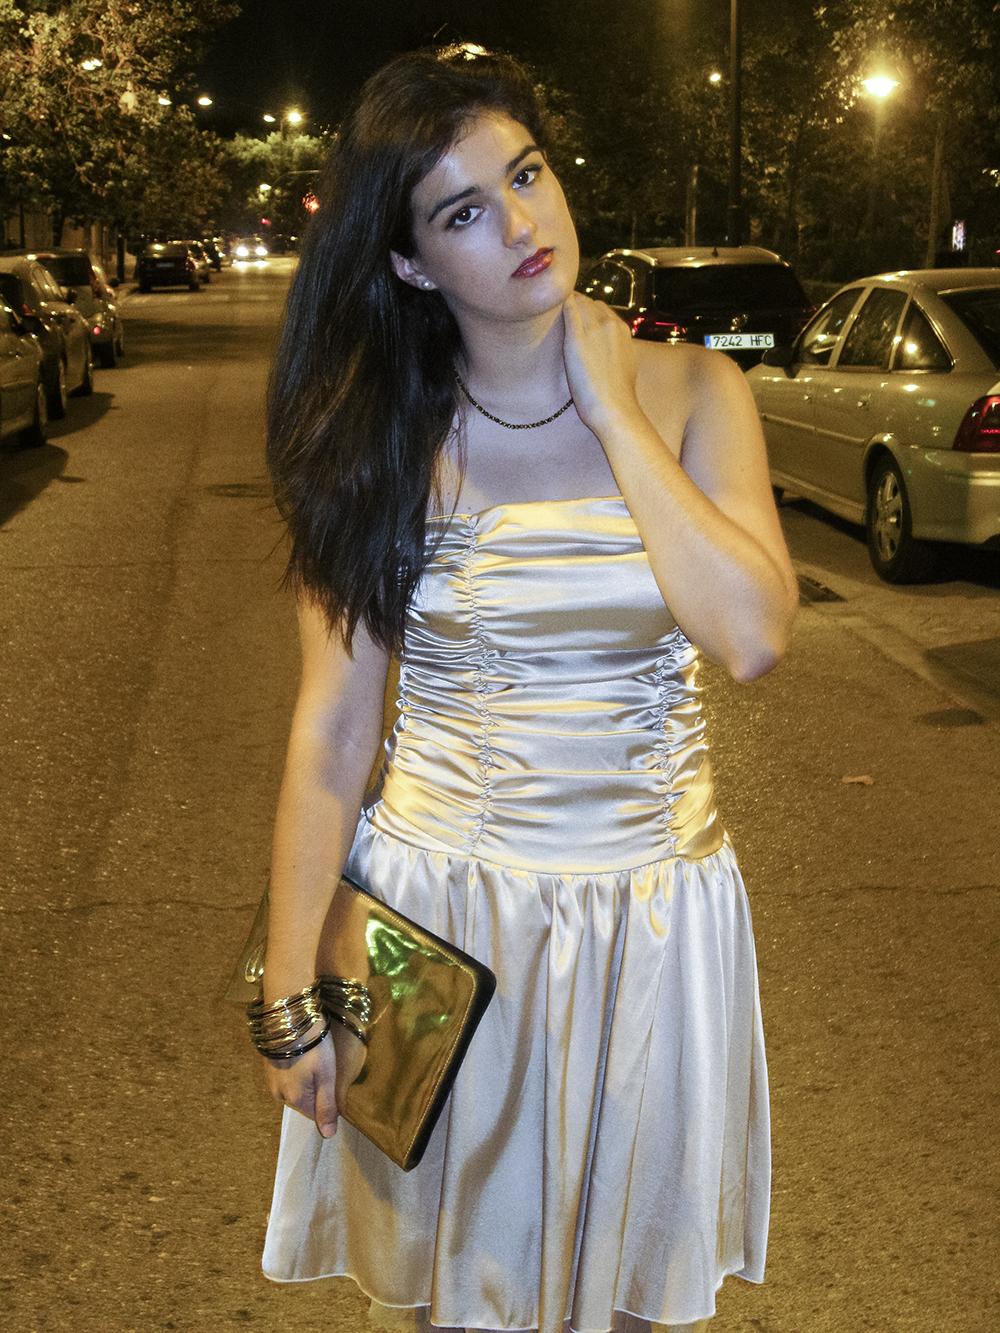 somethingfashion blogger valencia influencer spain_carolina herrera sandals_vintage dress beauty beast inspired 5